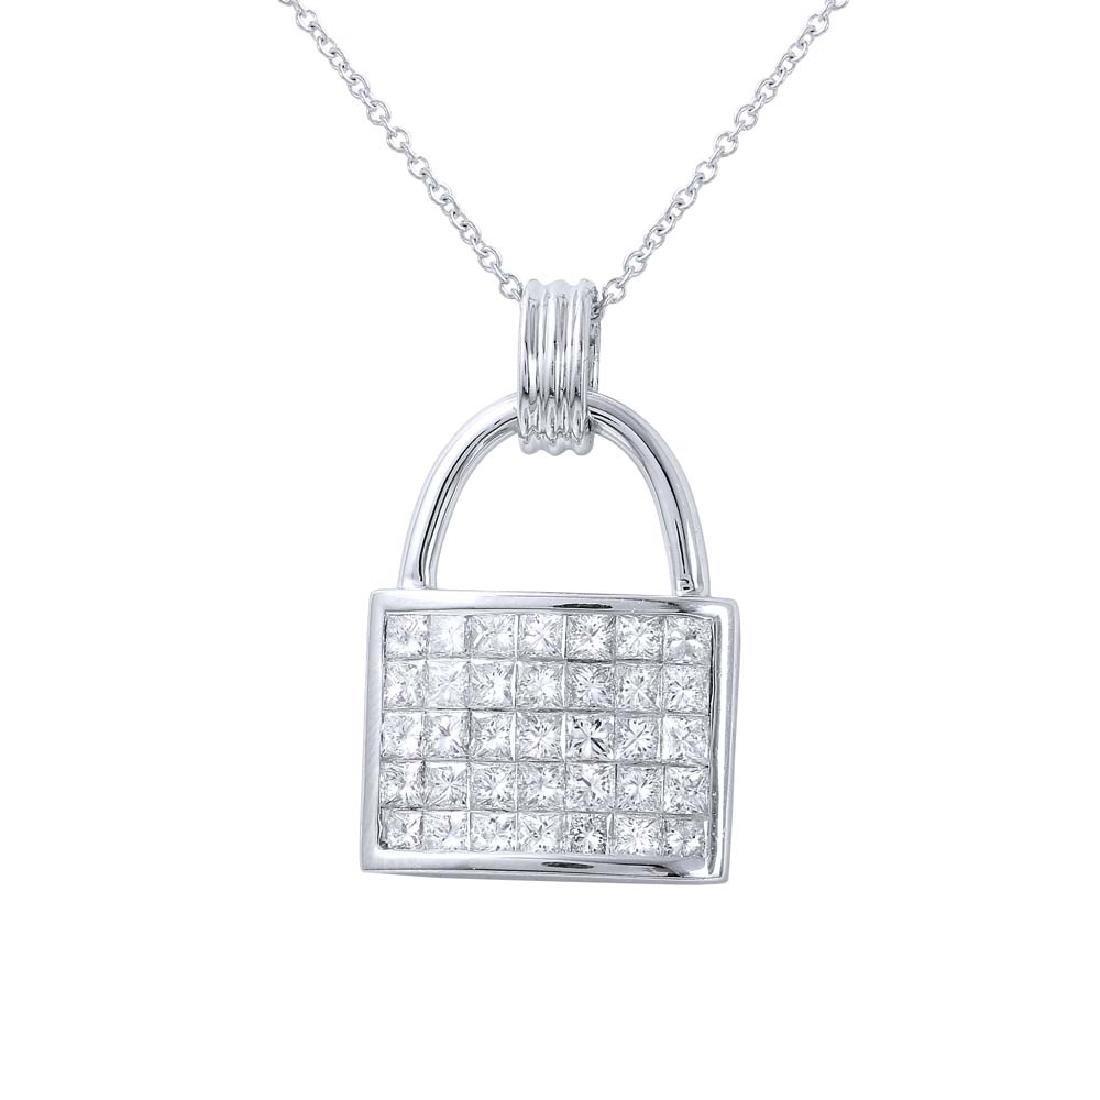 Genuine 1.79 TCW 14K White Gold Ladies Necklace